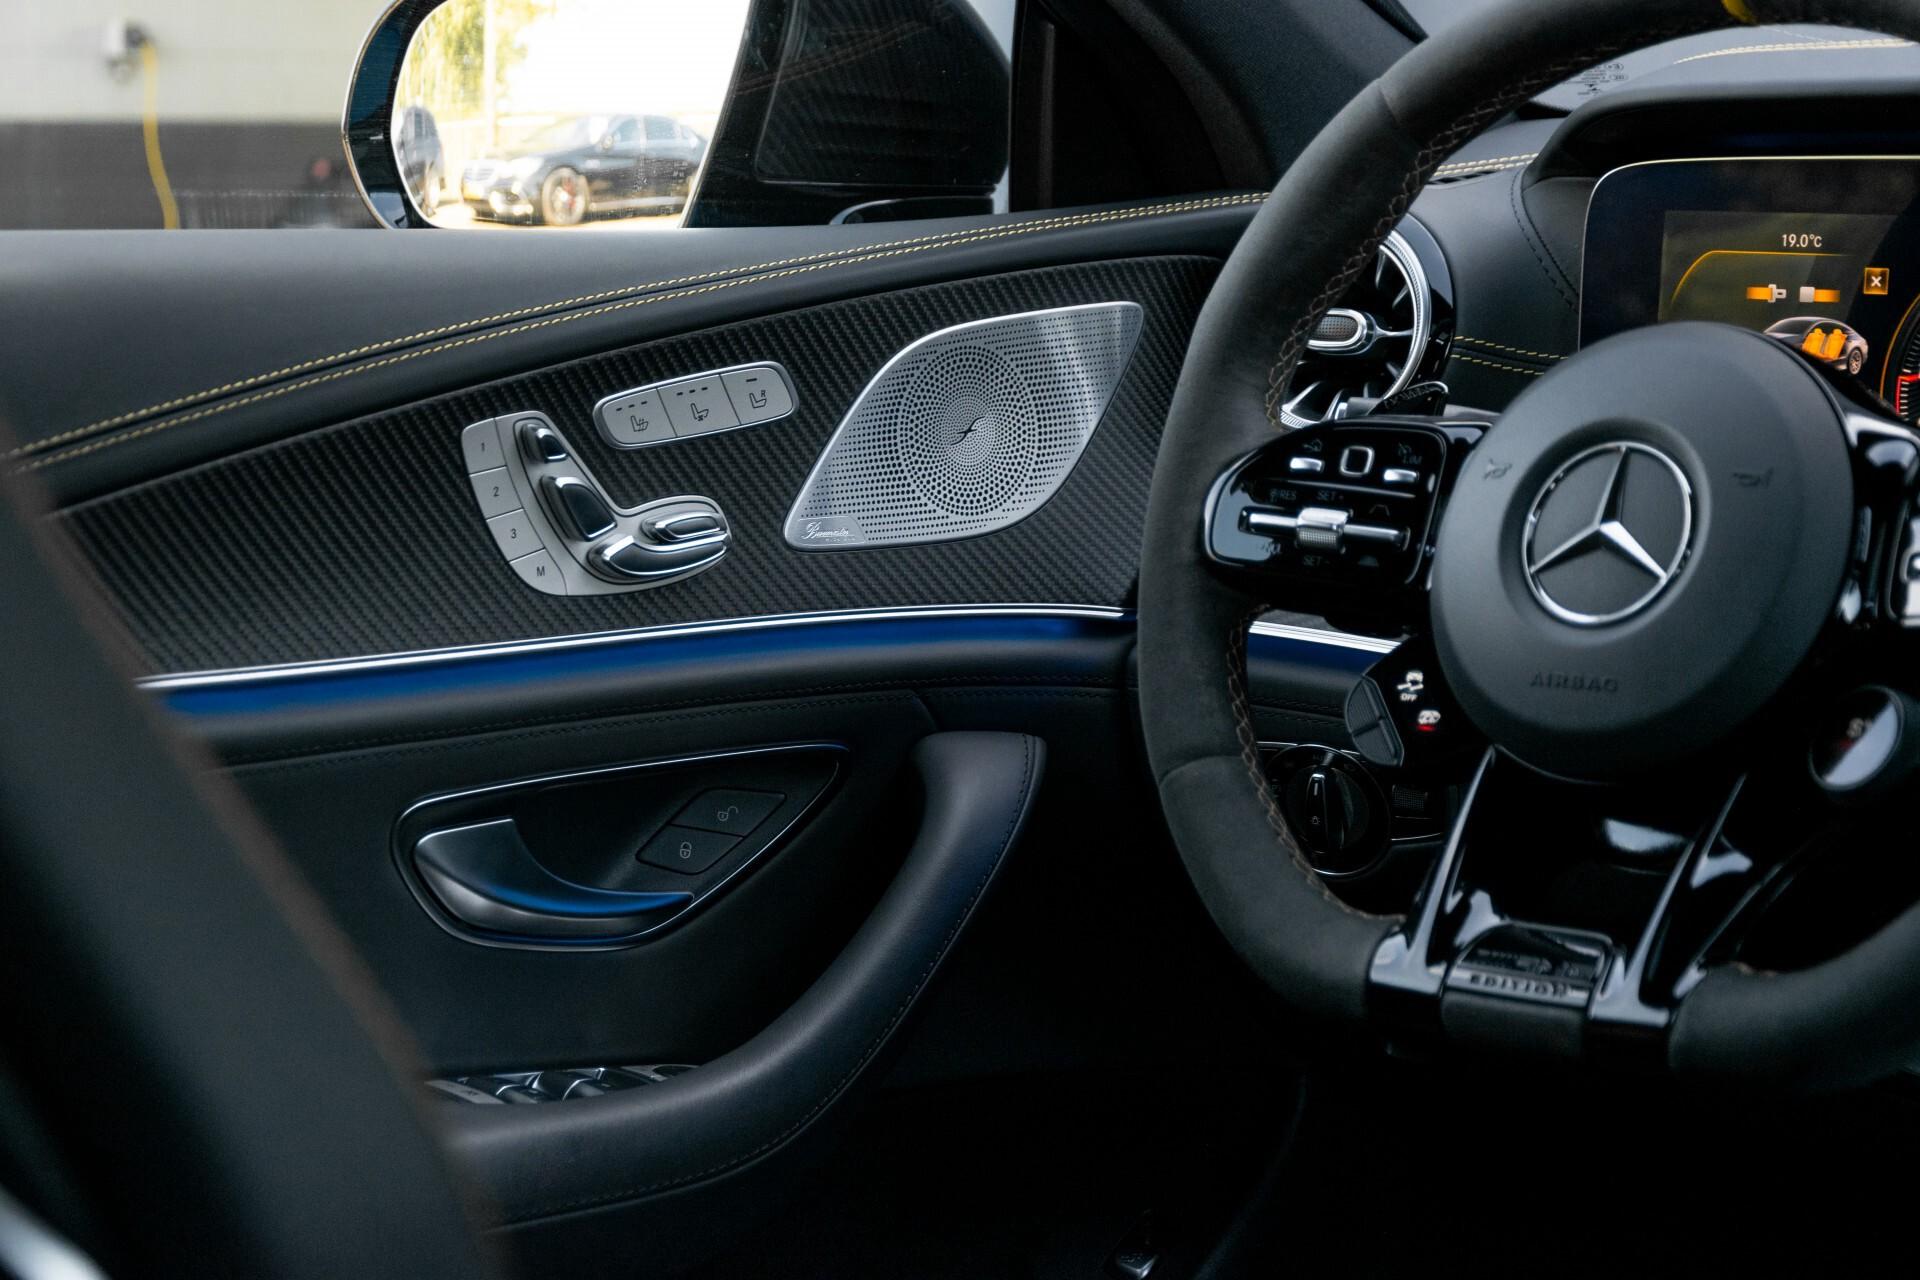 Mercedes-Benz AMG GT 4-Door Coupe 63 S 4MATIC+ Edition 1 Keramisch/Carbon/First Class/Dynamic Plus/Burmester High End 3D Aut9 Foto 61